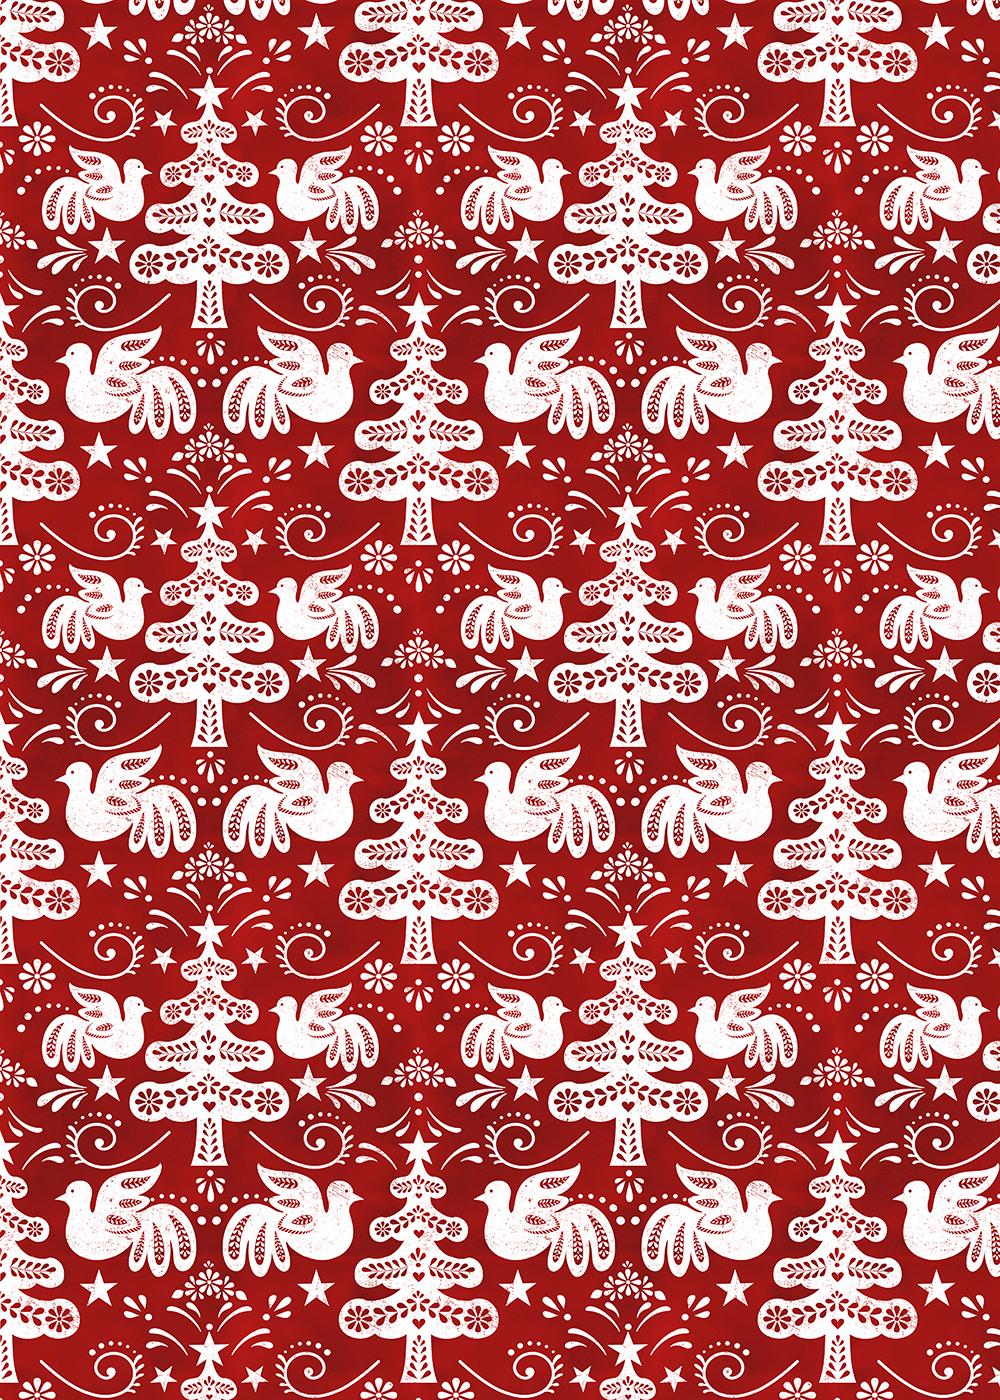 hygge Scandinavian folk art pattern winter Holiday Christmas xmas cozy